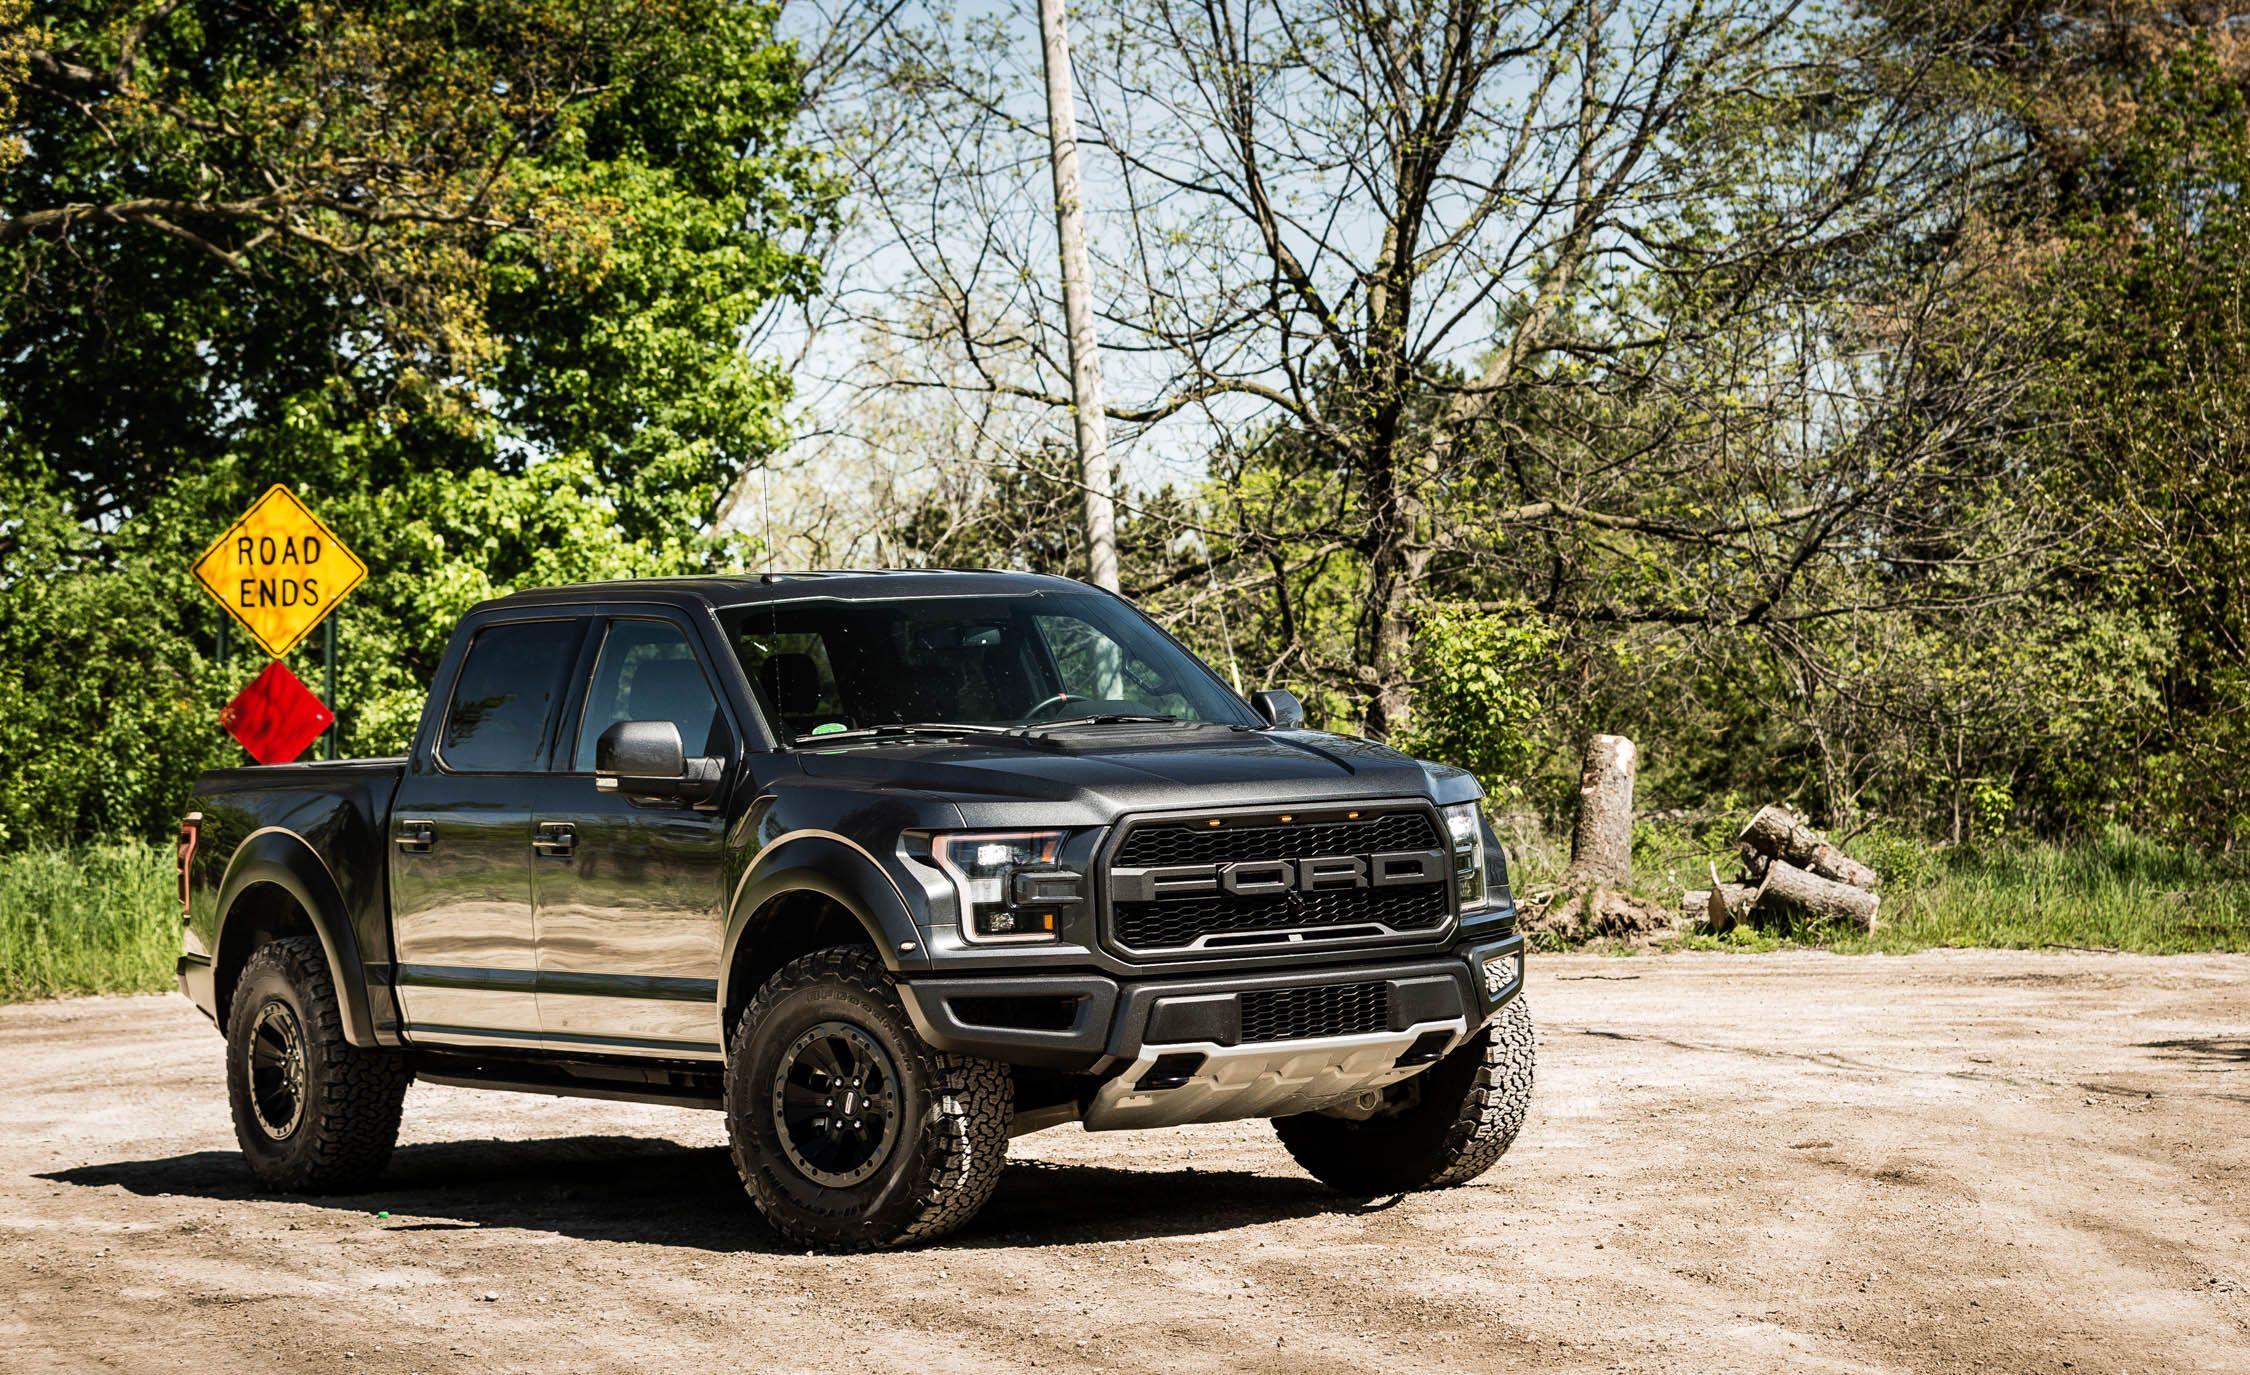 2018 ford f 150 raptor interior review car and driver. Black Bedroom Furniture Sets. Home Design Ideas